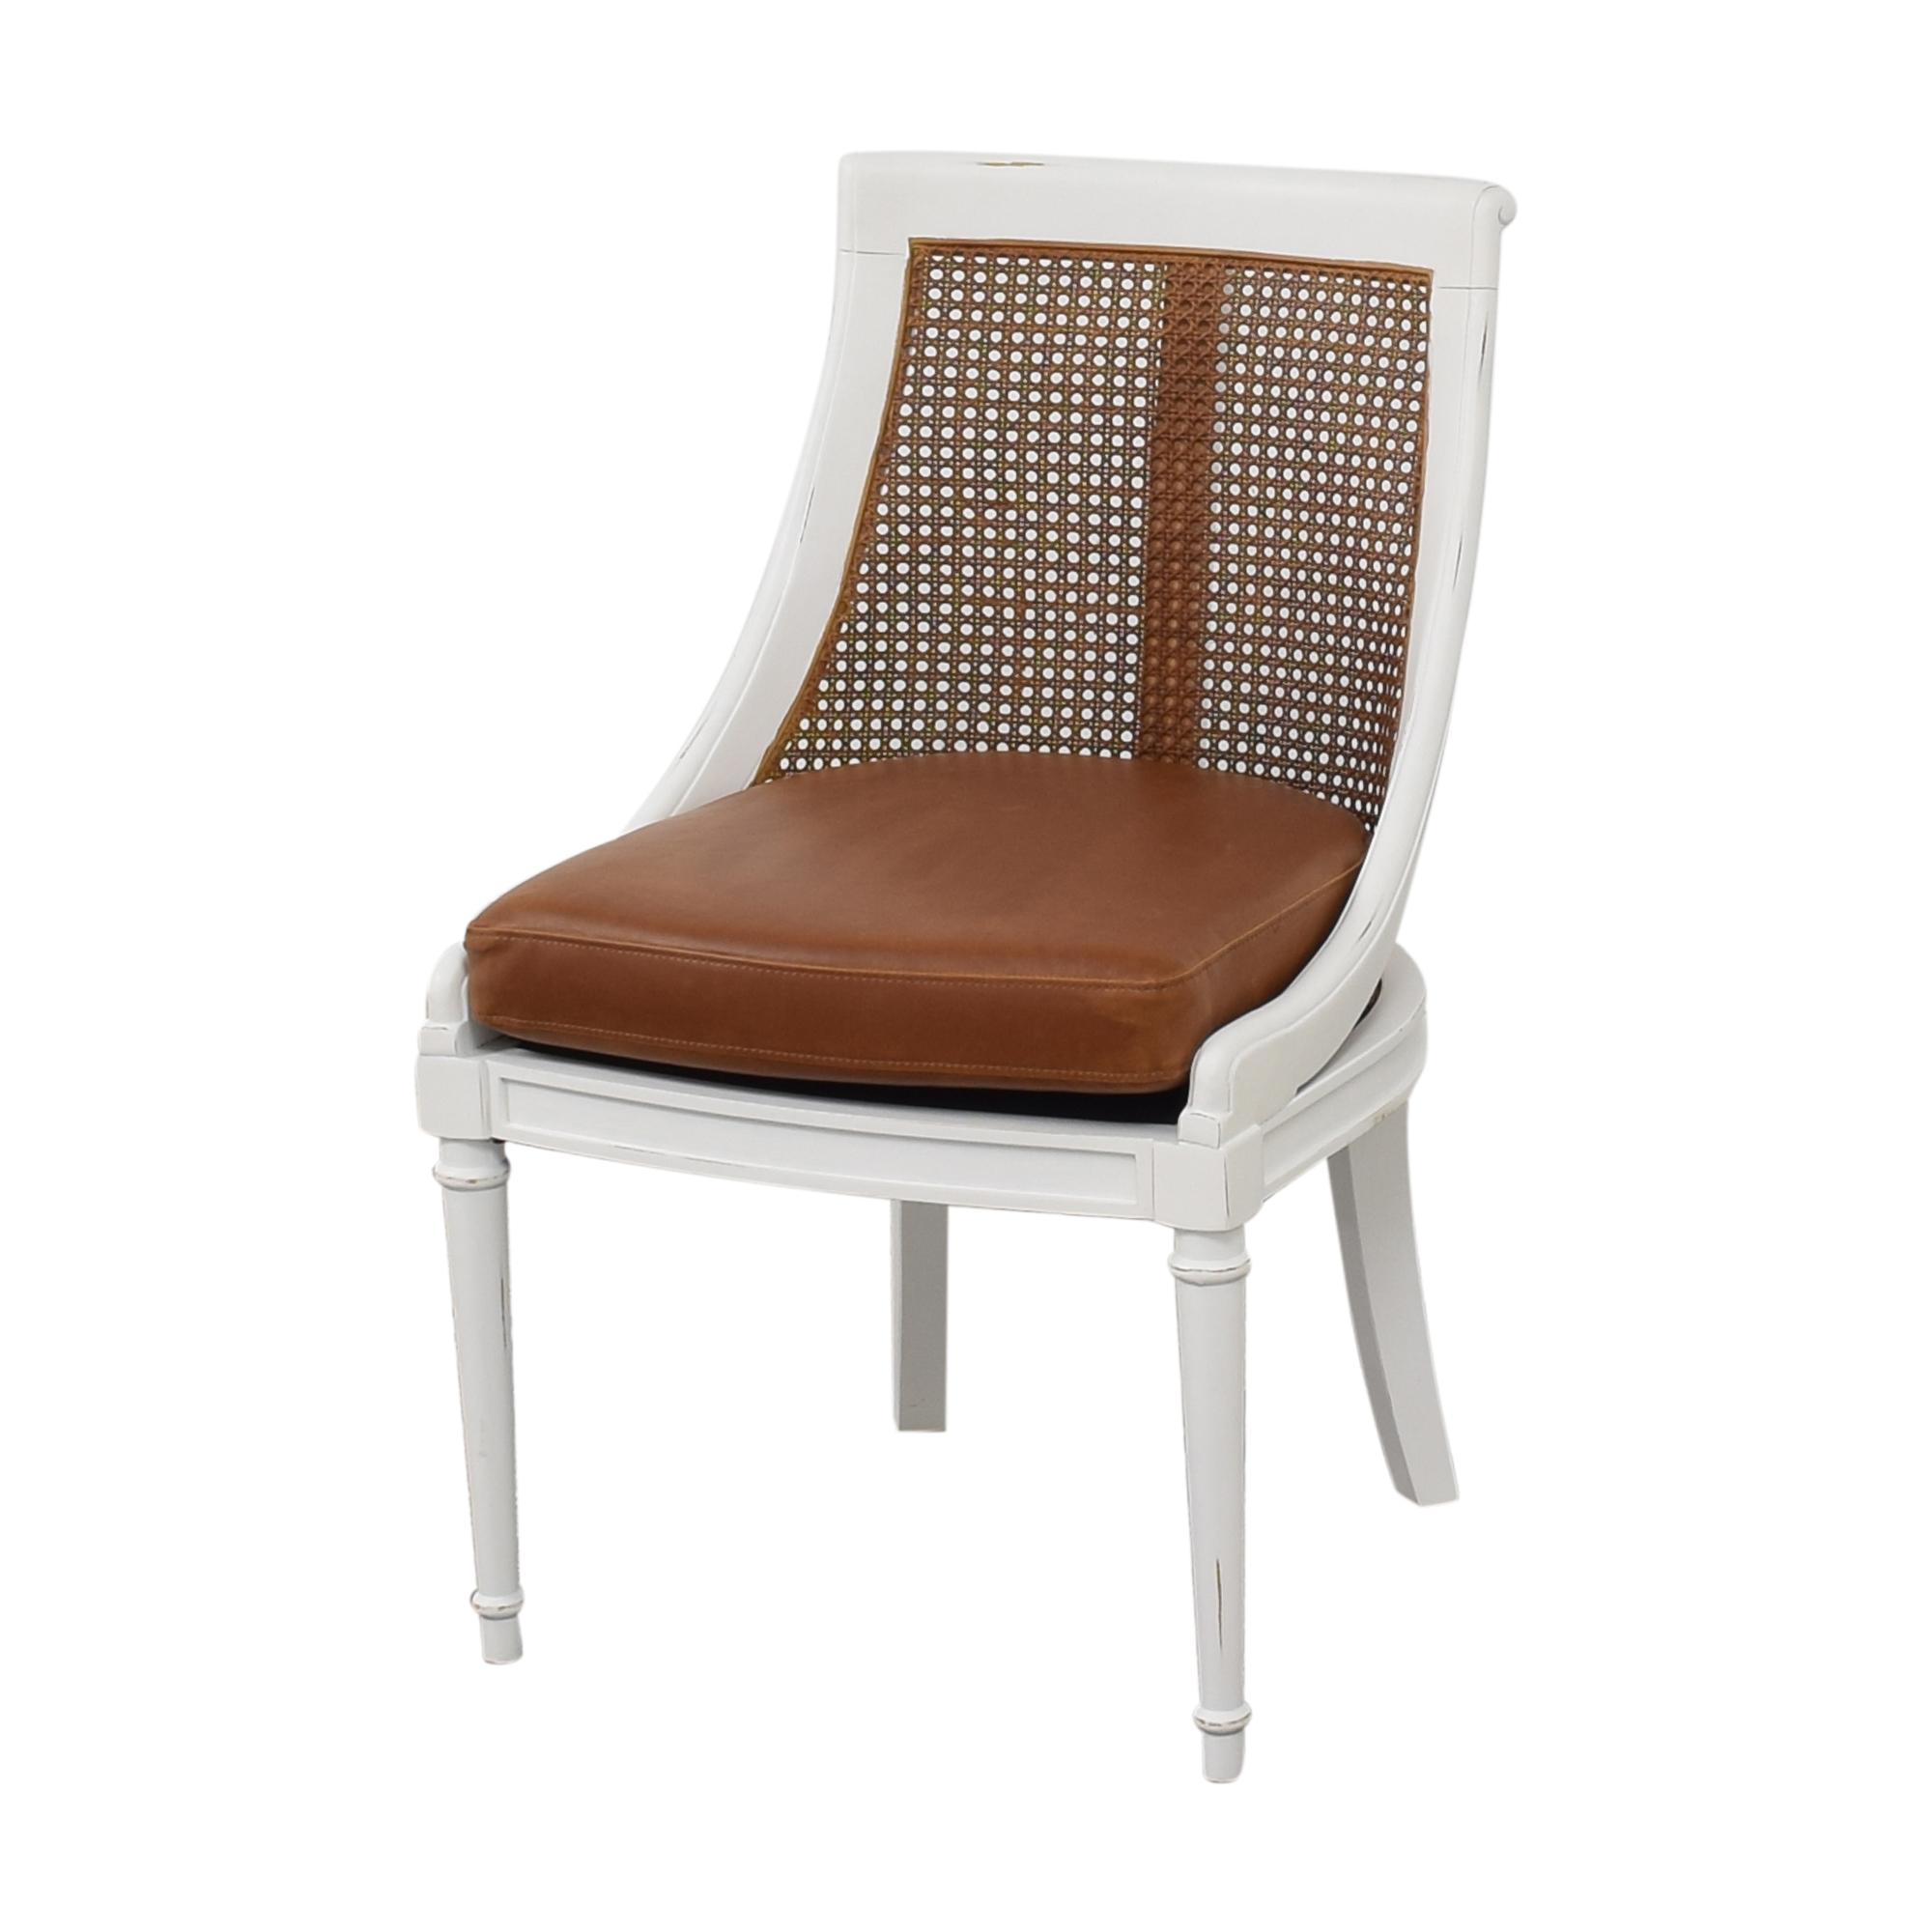 buy Safavieh Saylor Dining Chair Safavieh